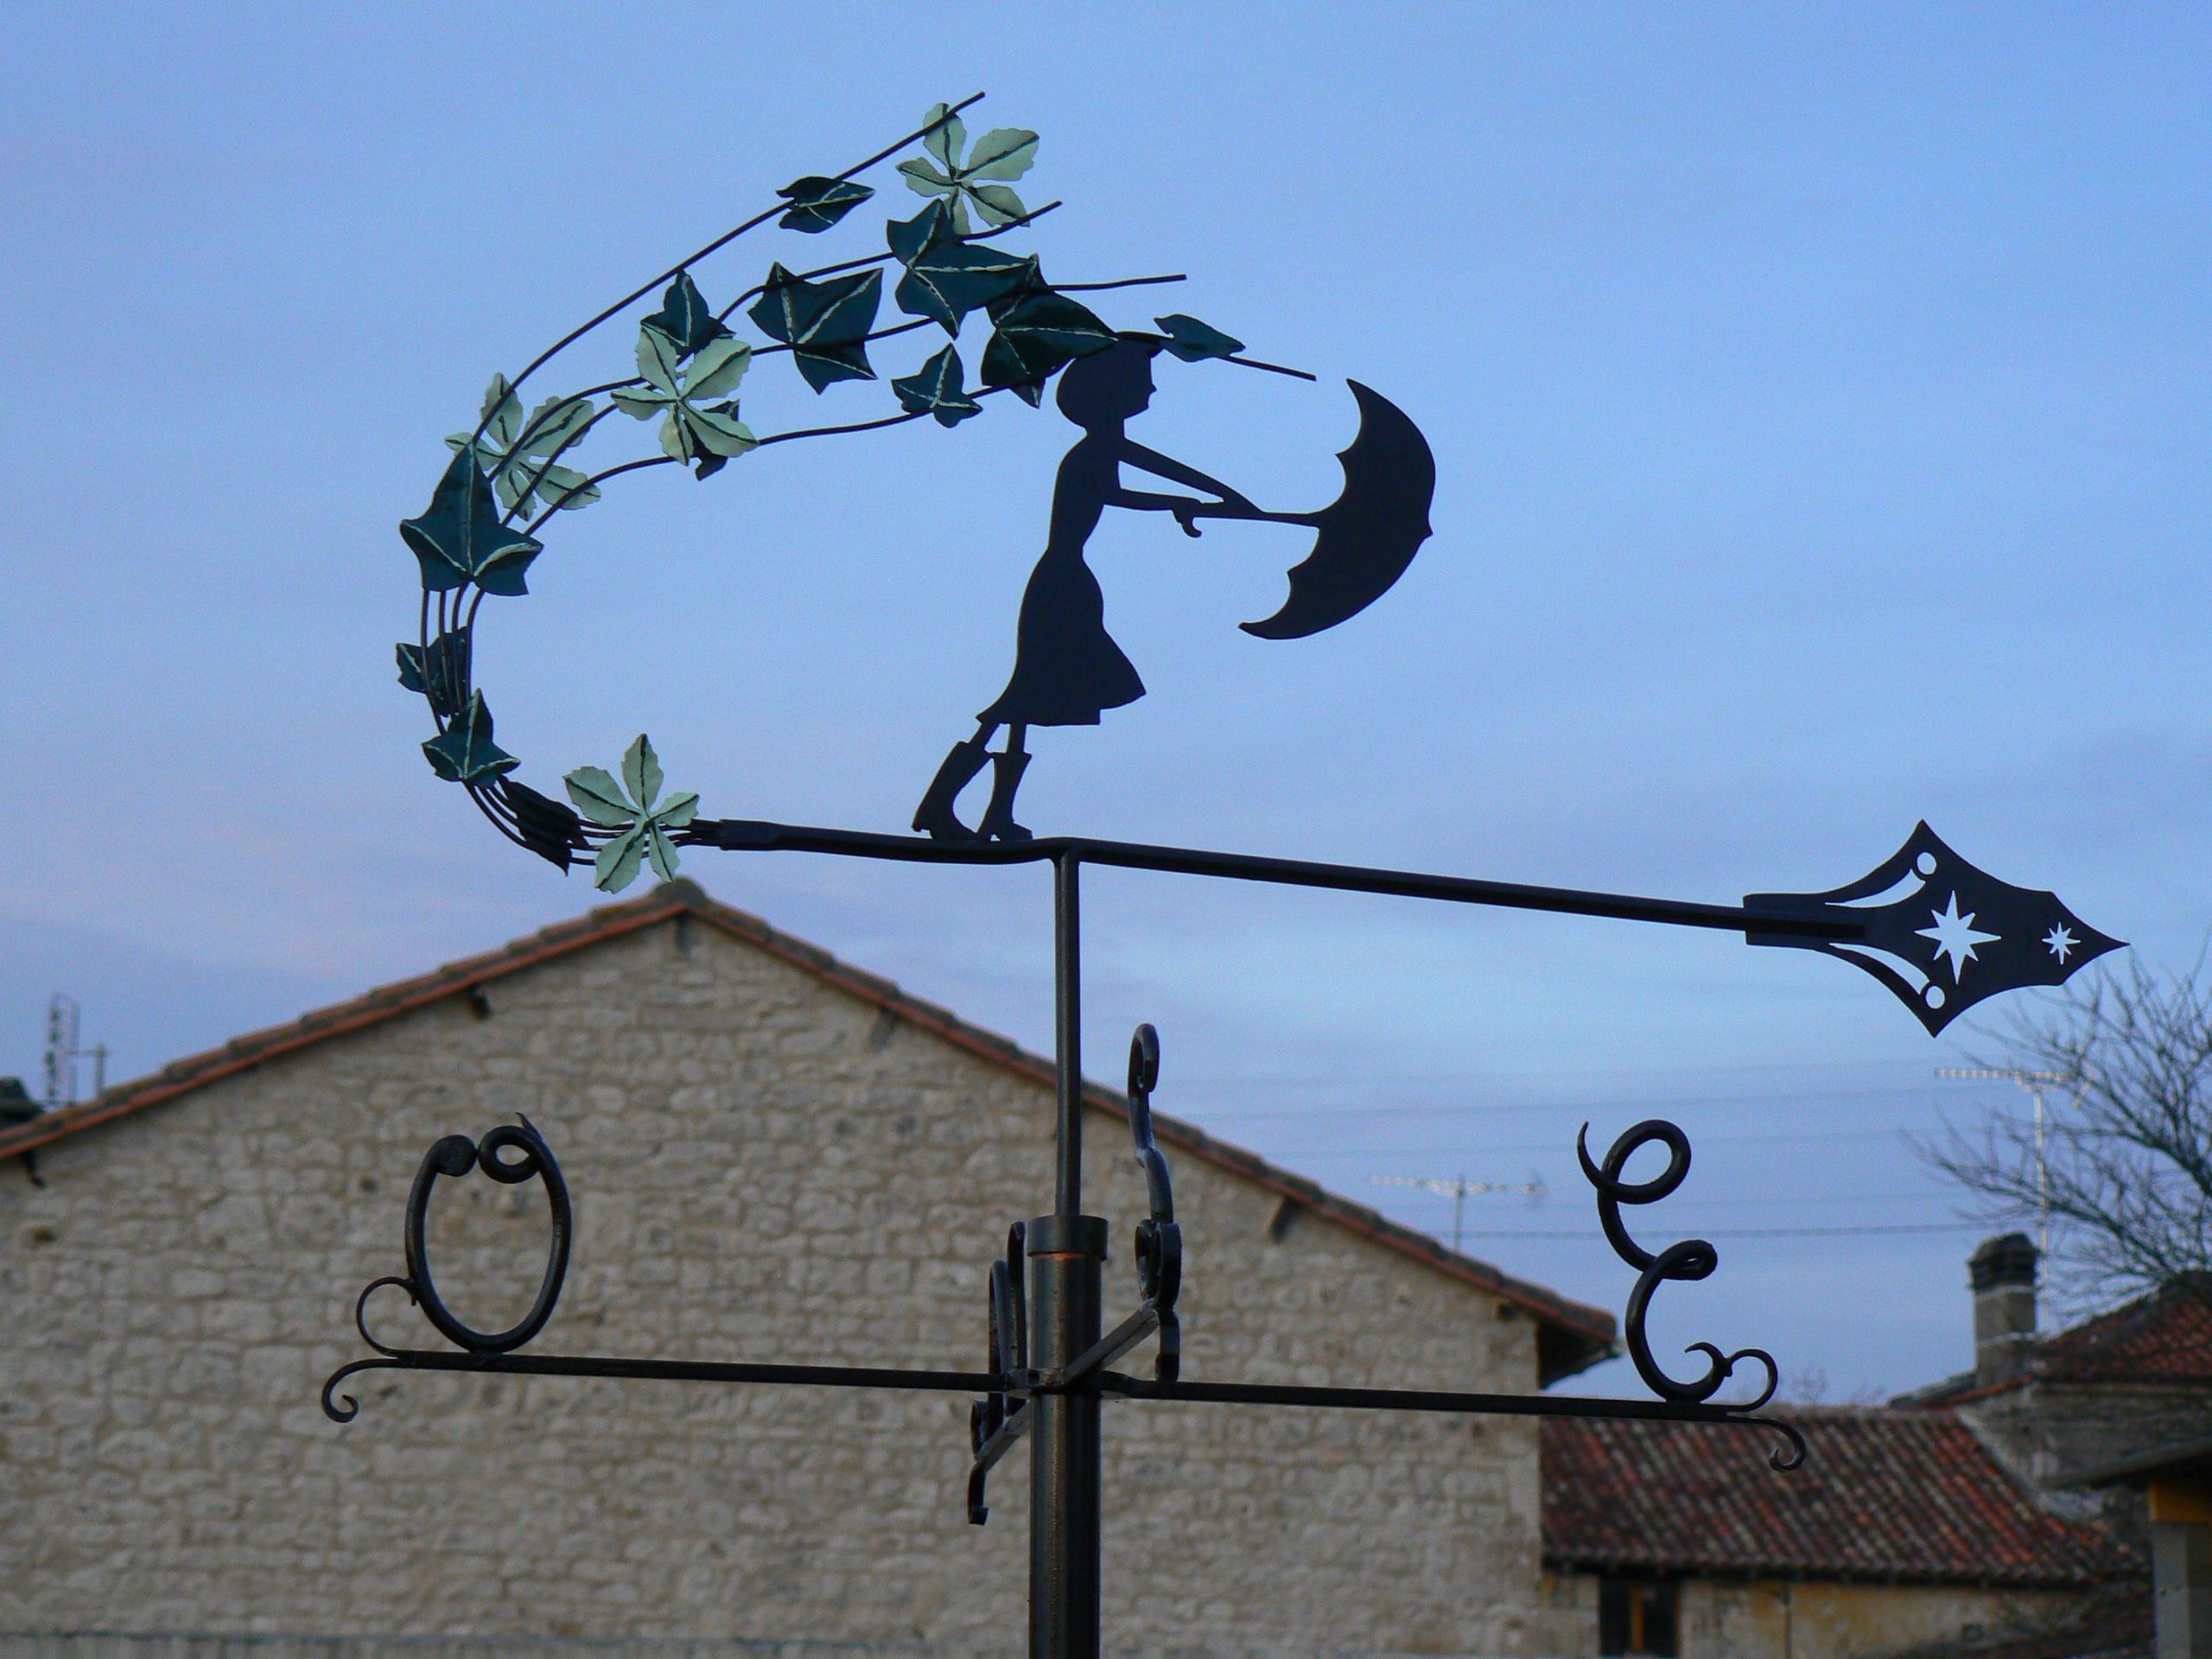 Girouette   Weather Vanes, Weathervanes, Witch House concernant Girouette Jardin Deco